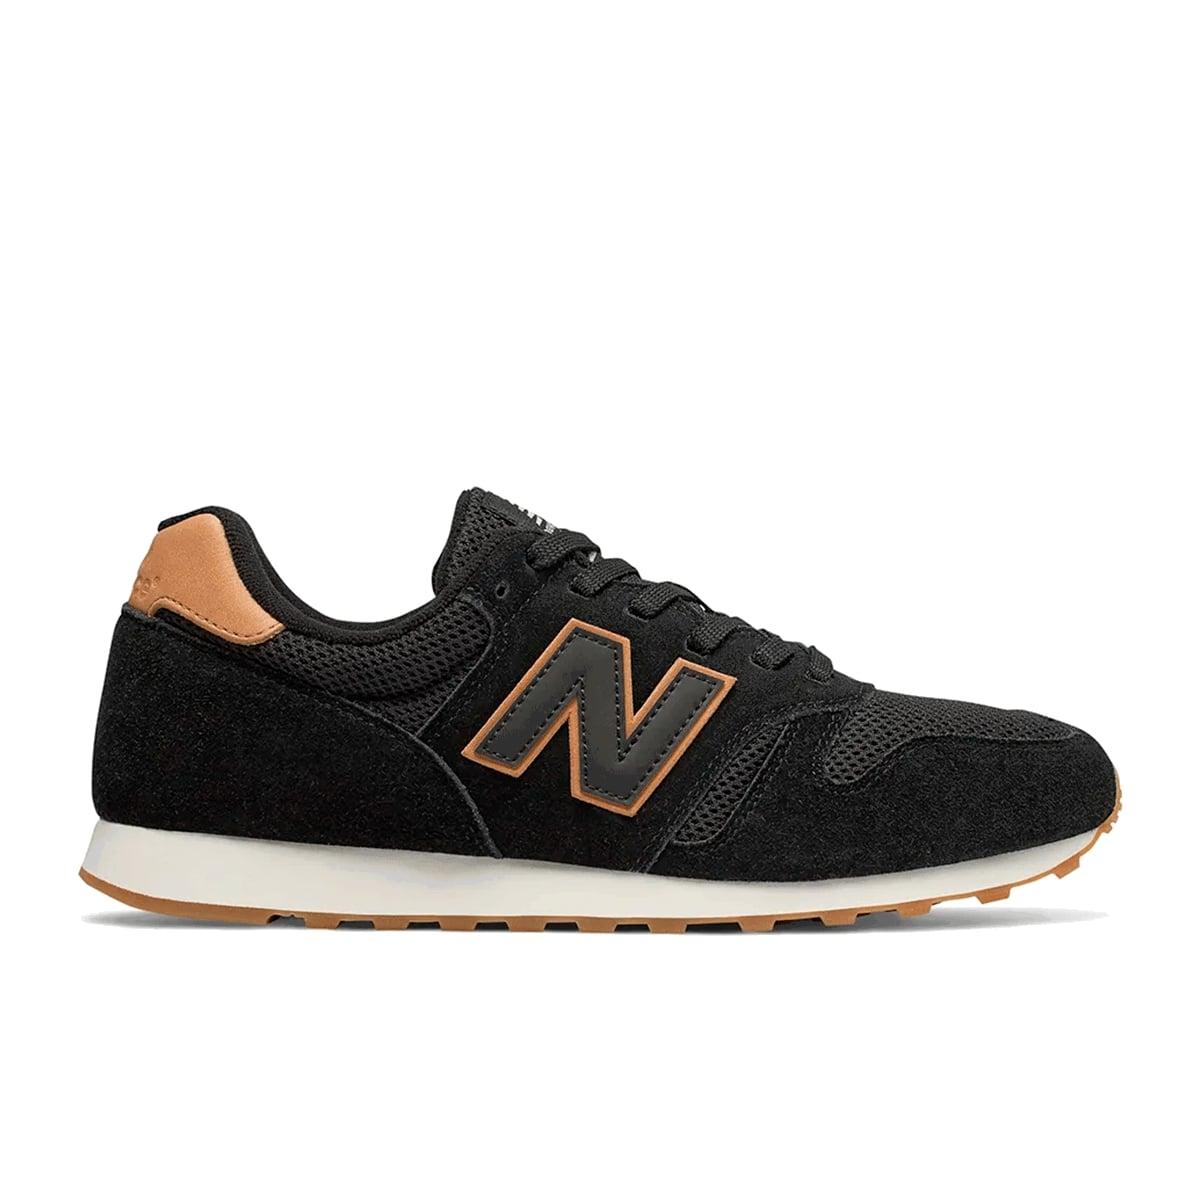 Tênis New Balance 373 Casual Masculino Preto